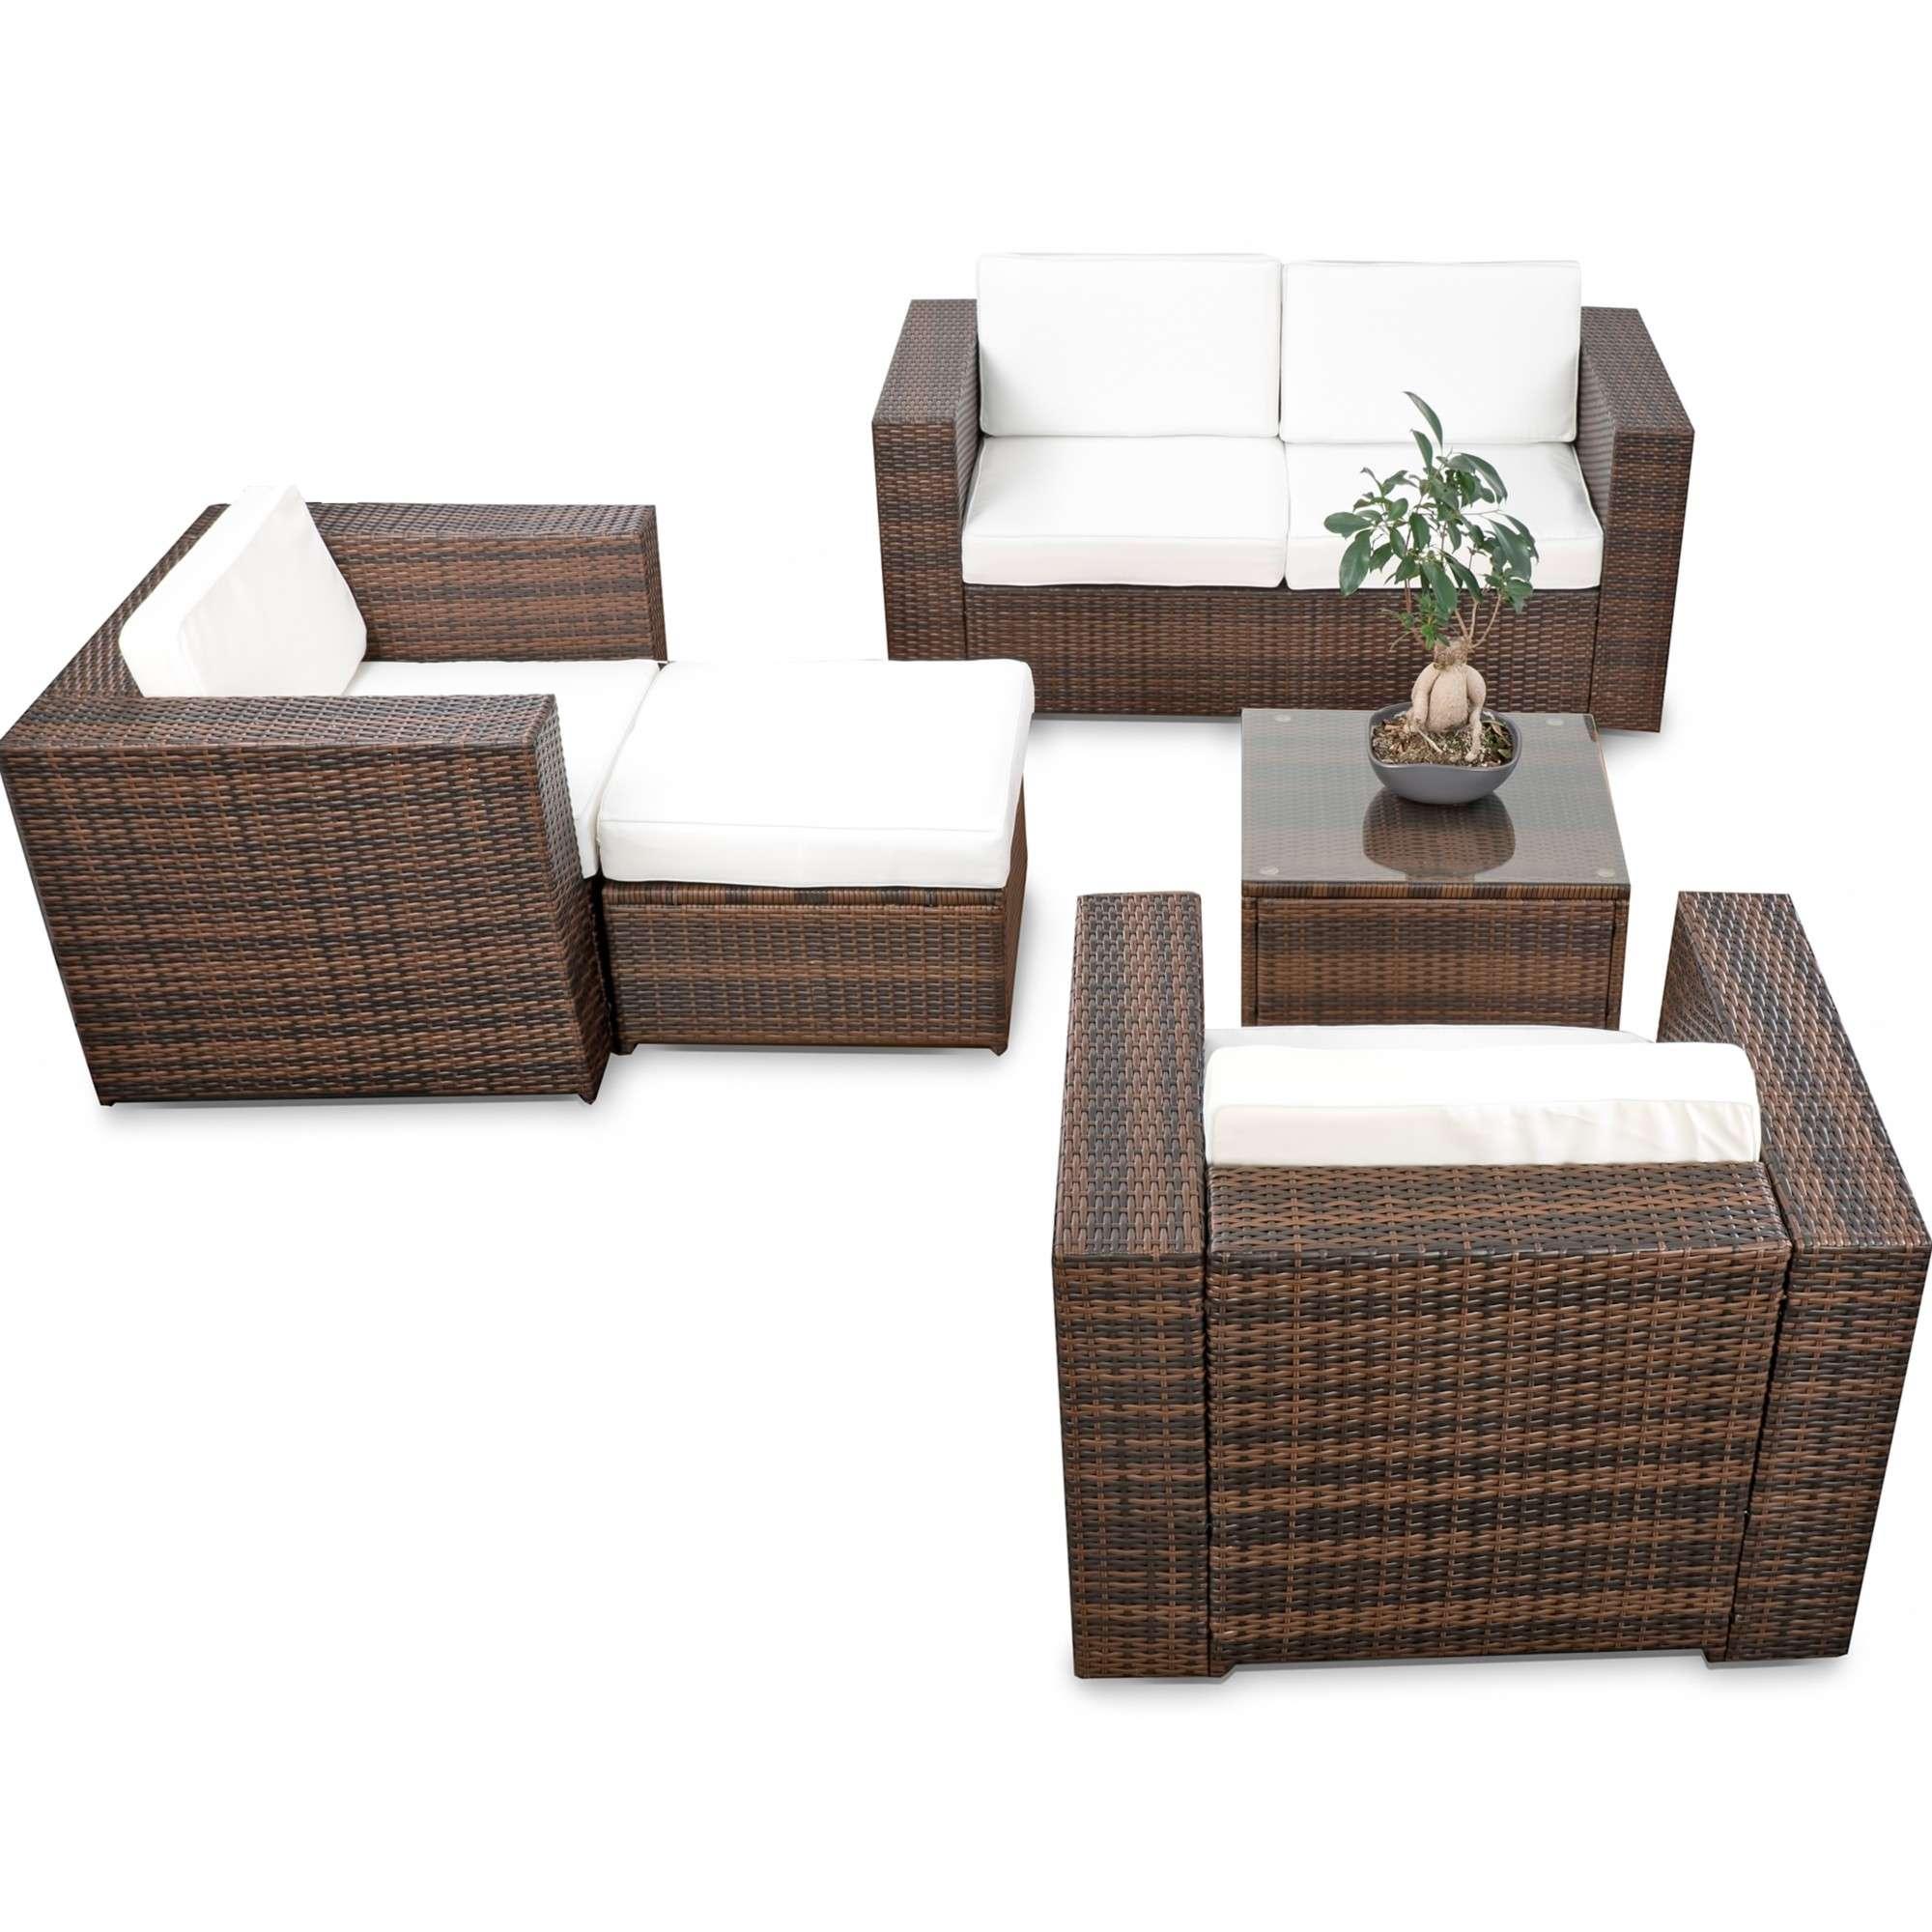 balkon loungemoebel xl 15 tlg polyrattan braun 1280x1280 2x